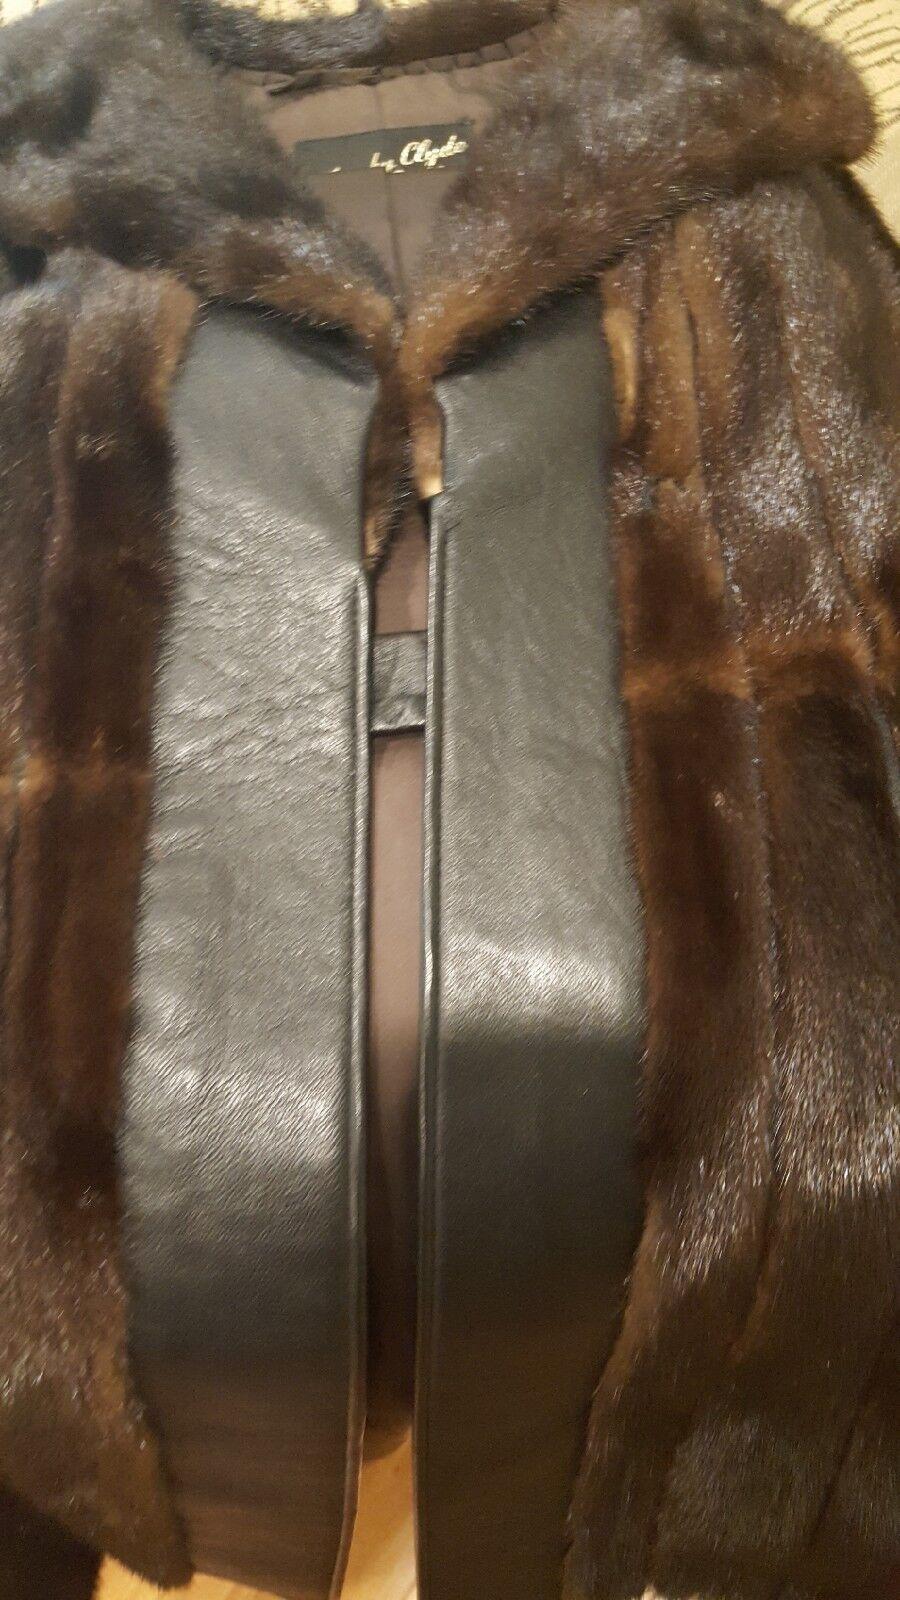 Used 50's Era Mink Leather And Fur Coat